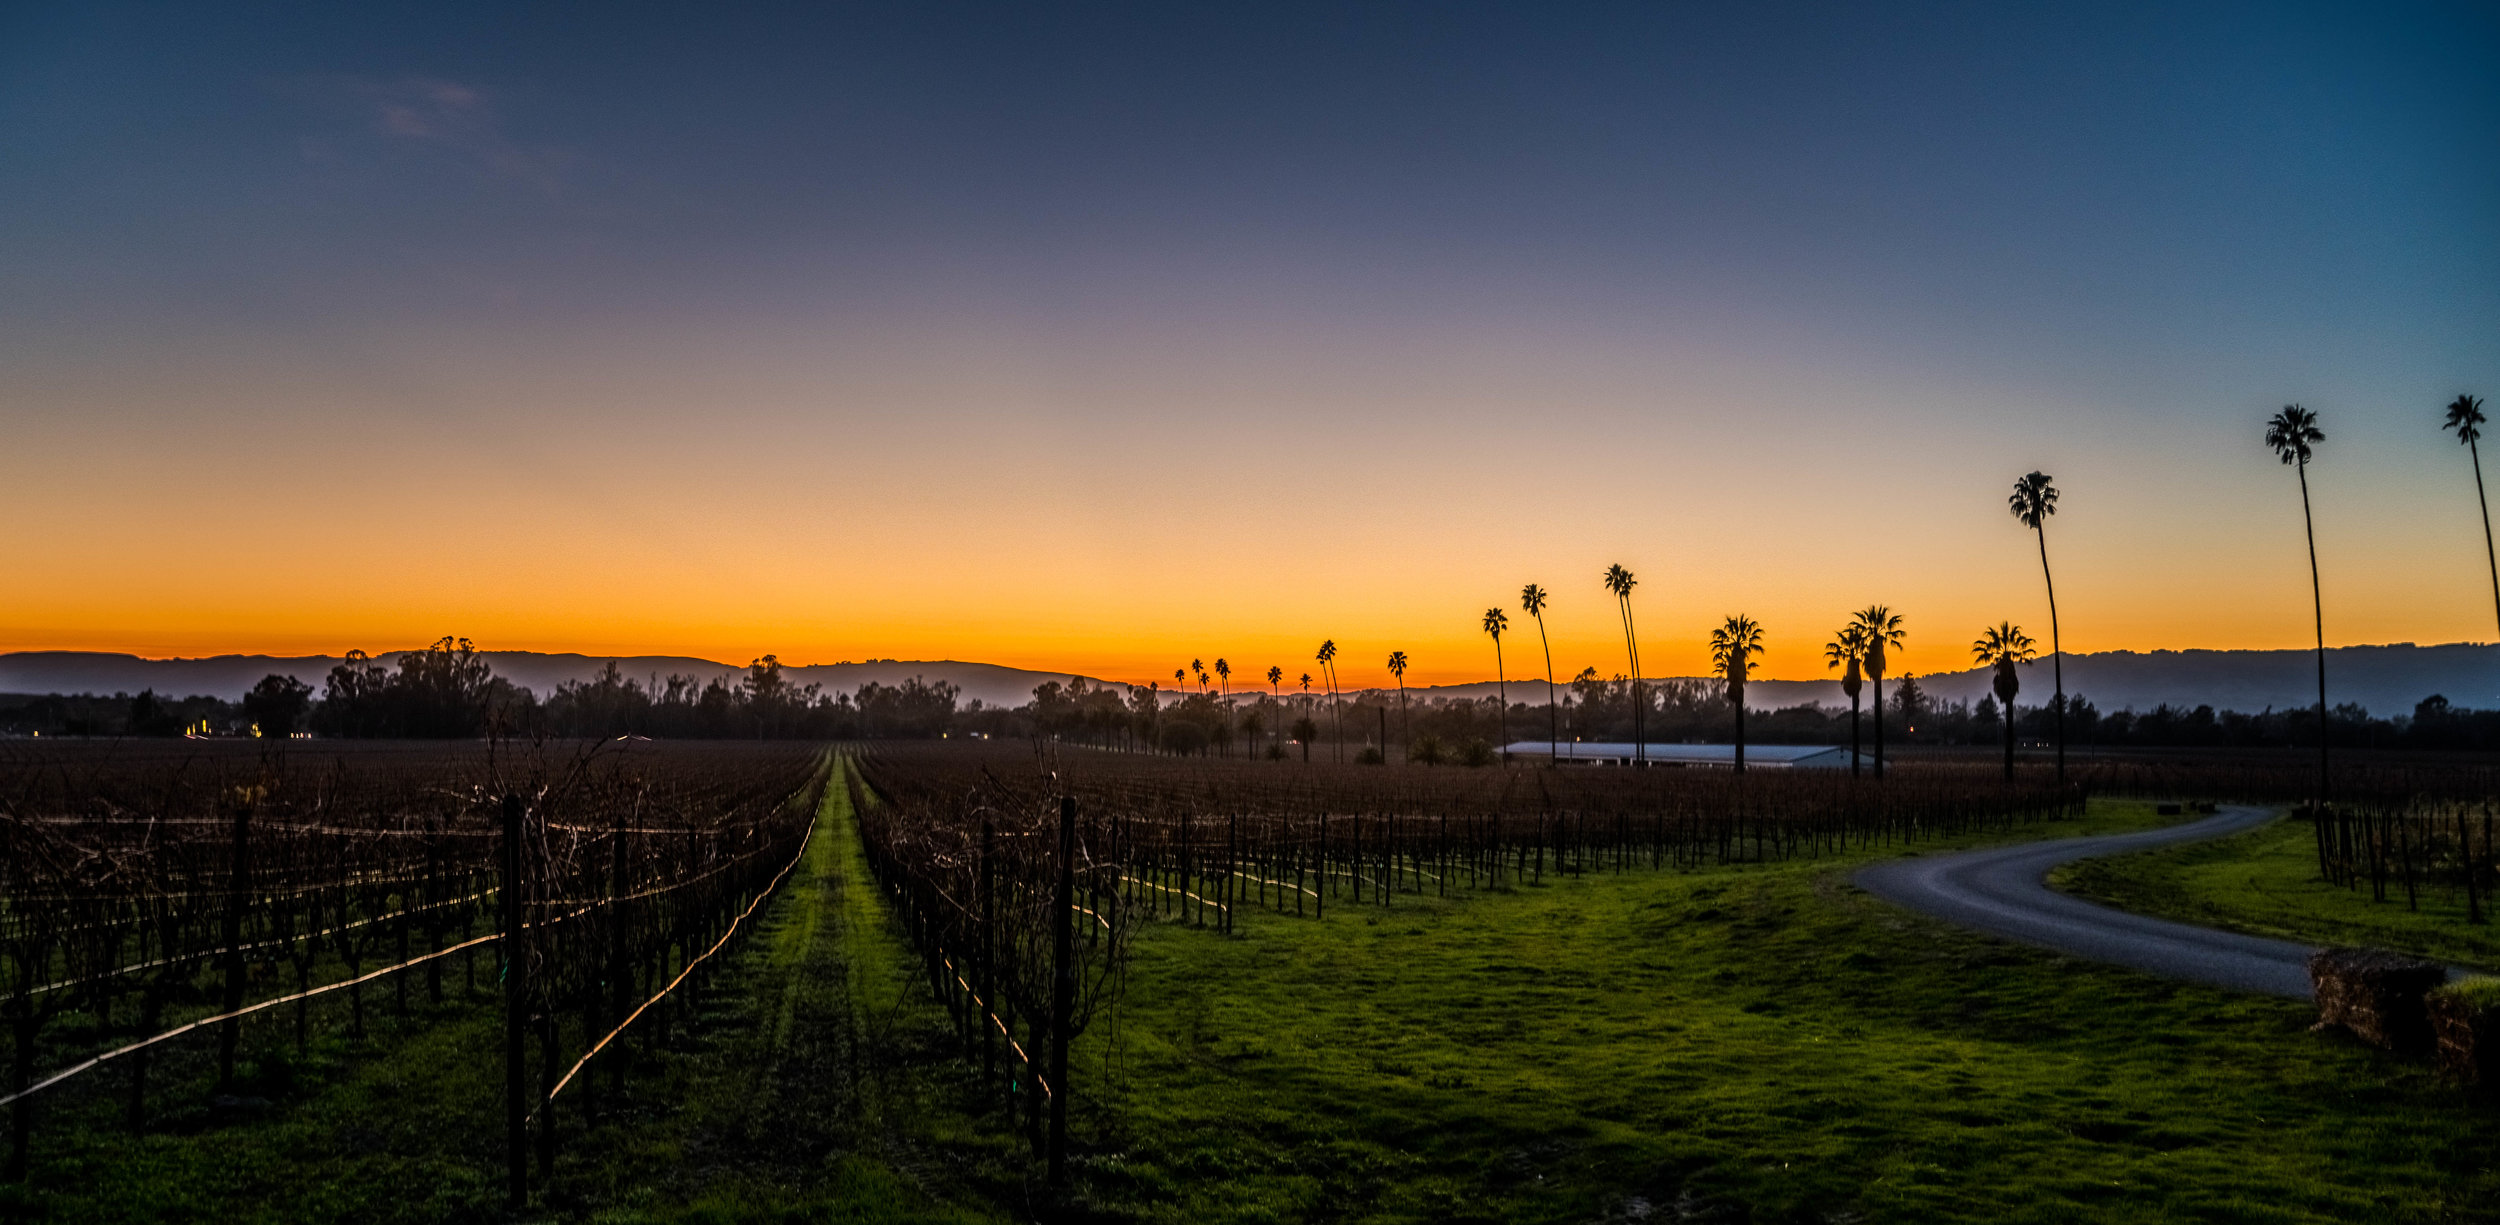 Scribe Winery - Sunset views